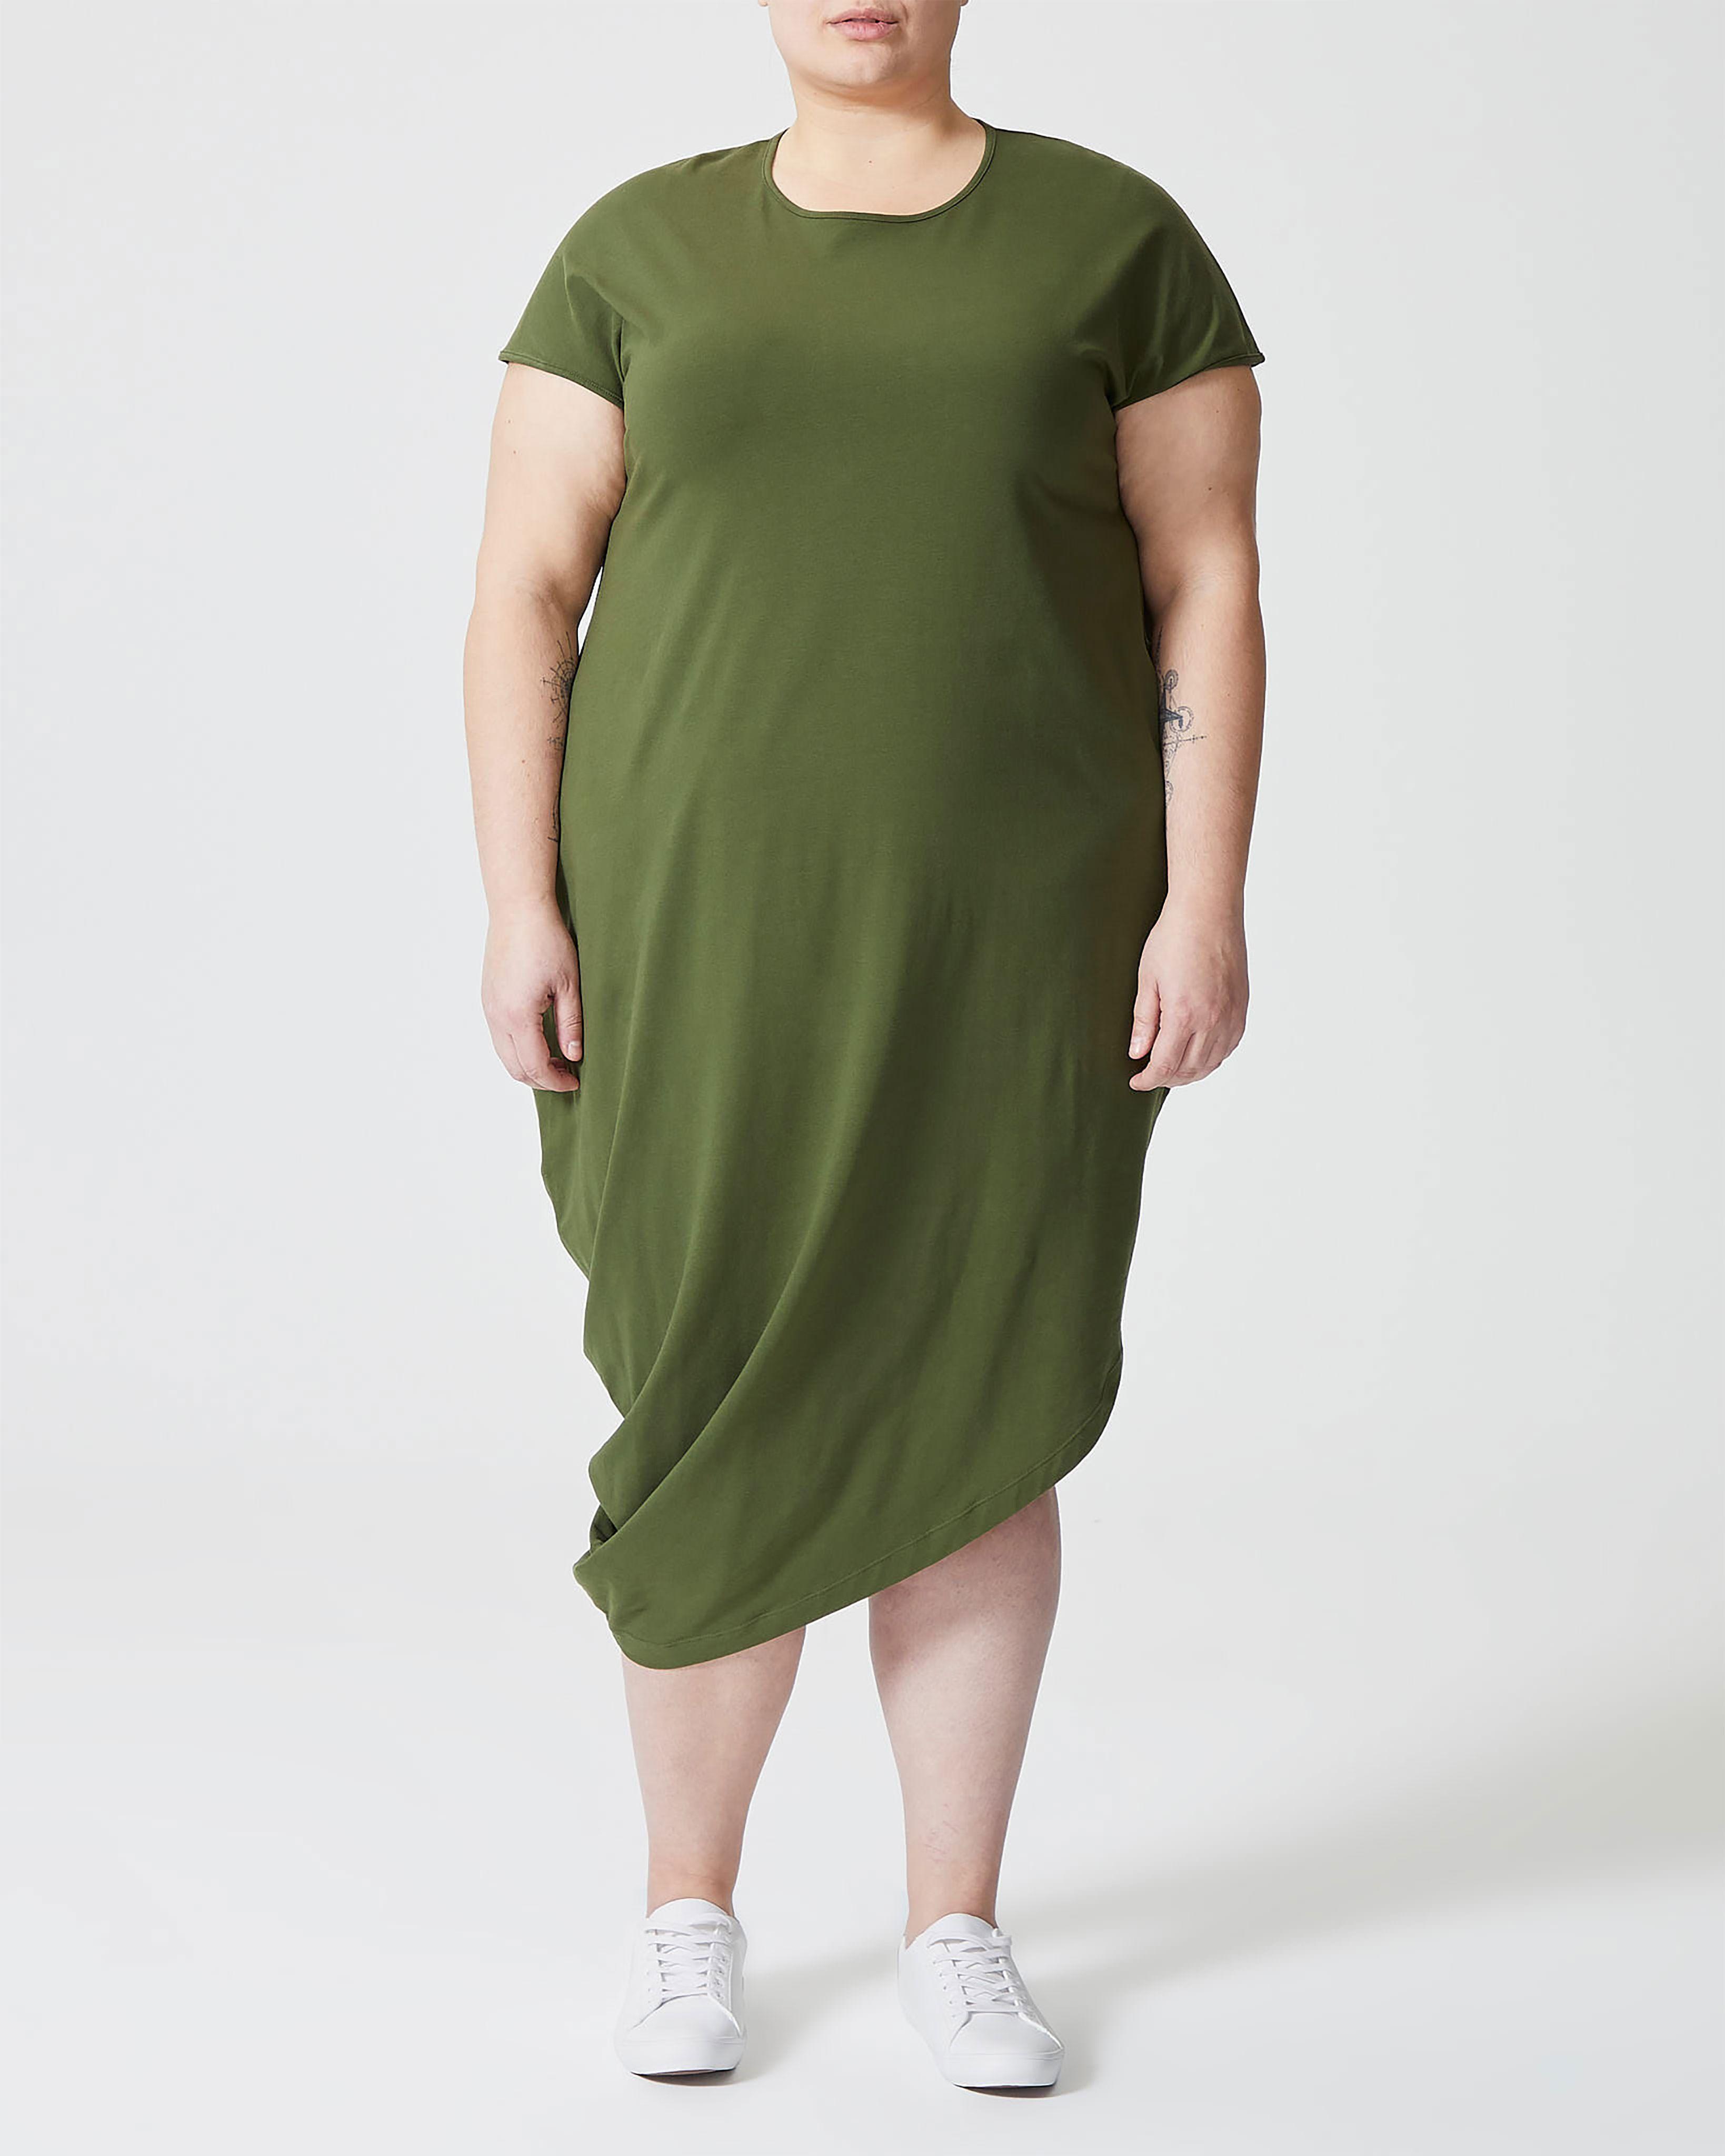 Iconic Geneva Dress - Camo